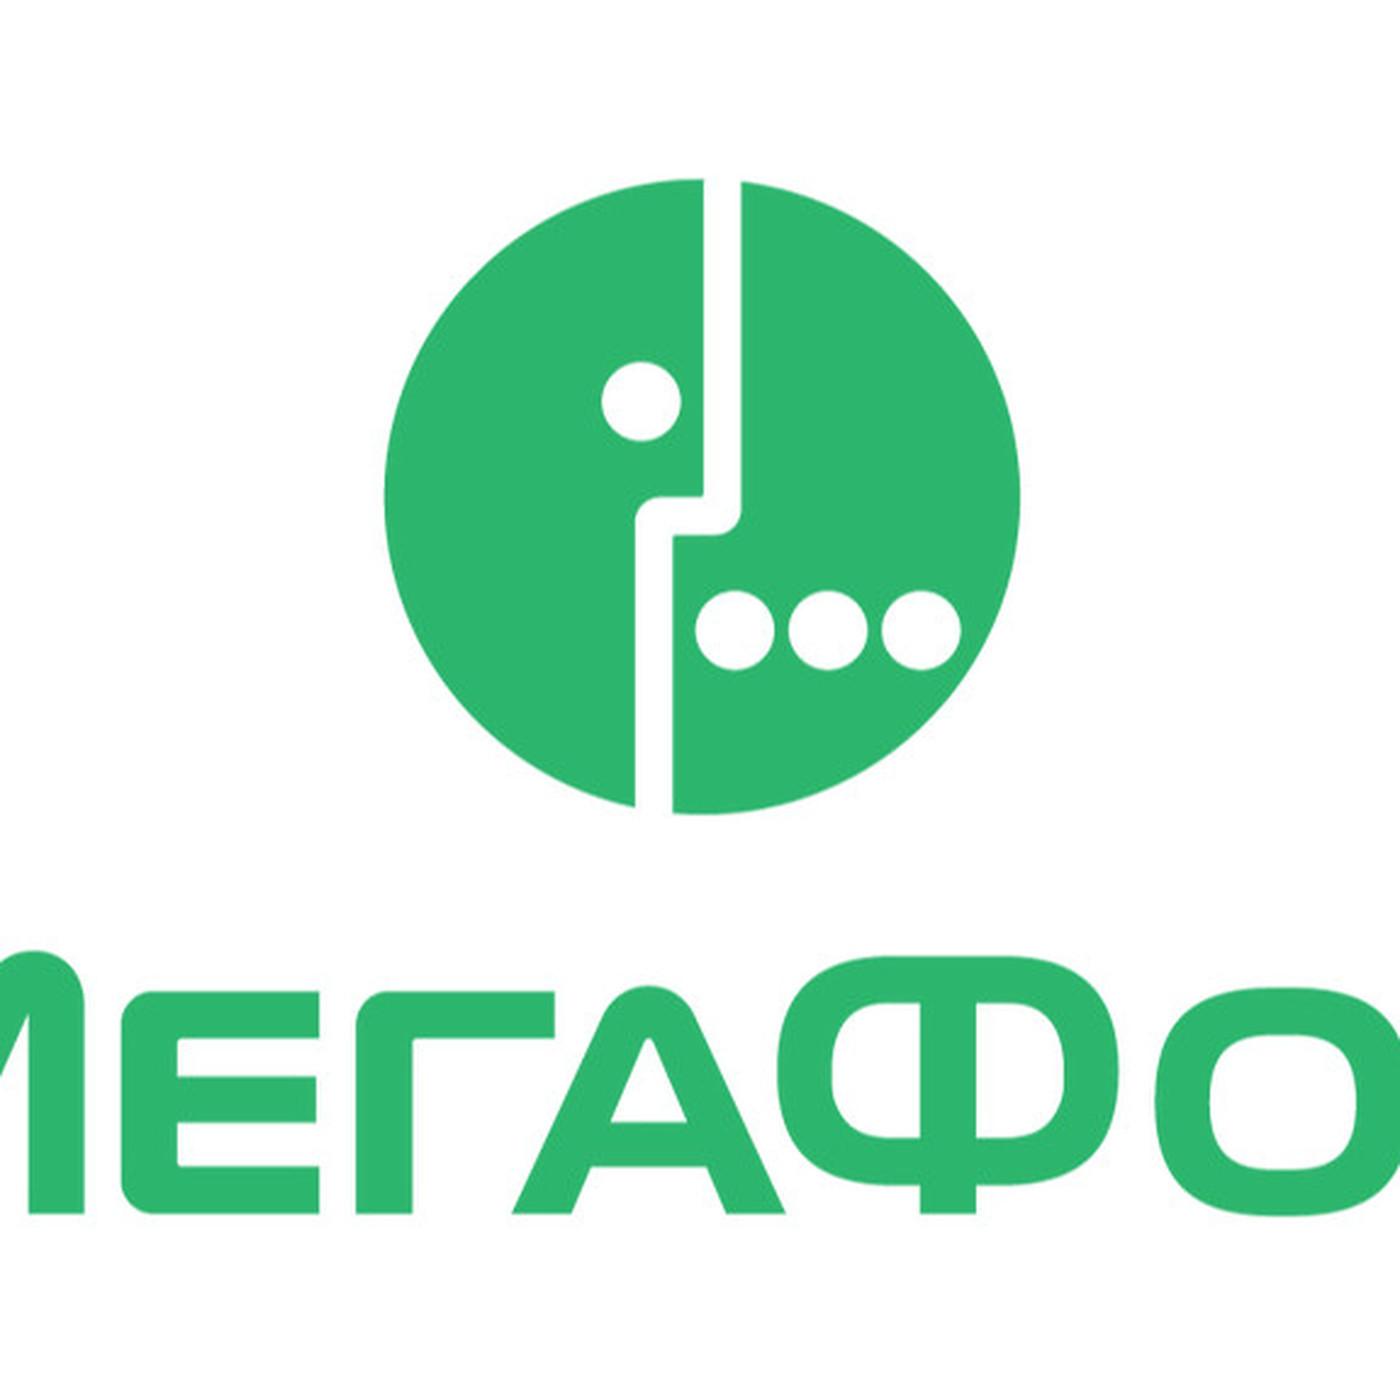 Абоненты МегаФона столкнулись с масштабным сбоем сети